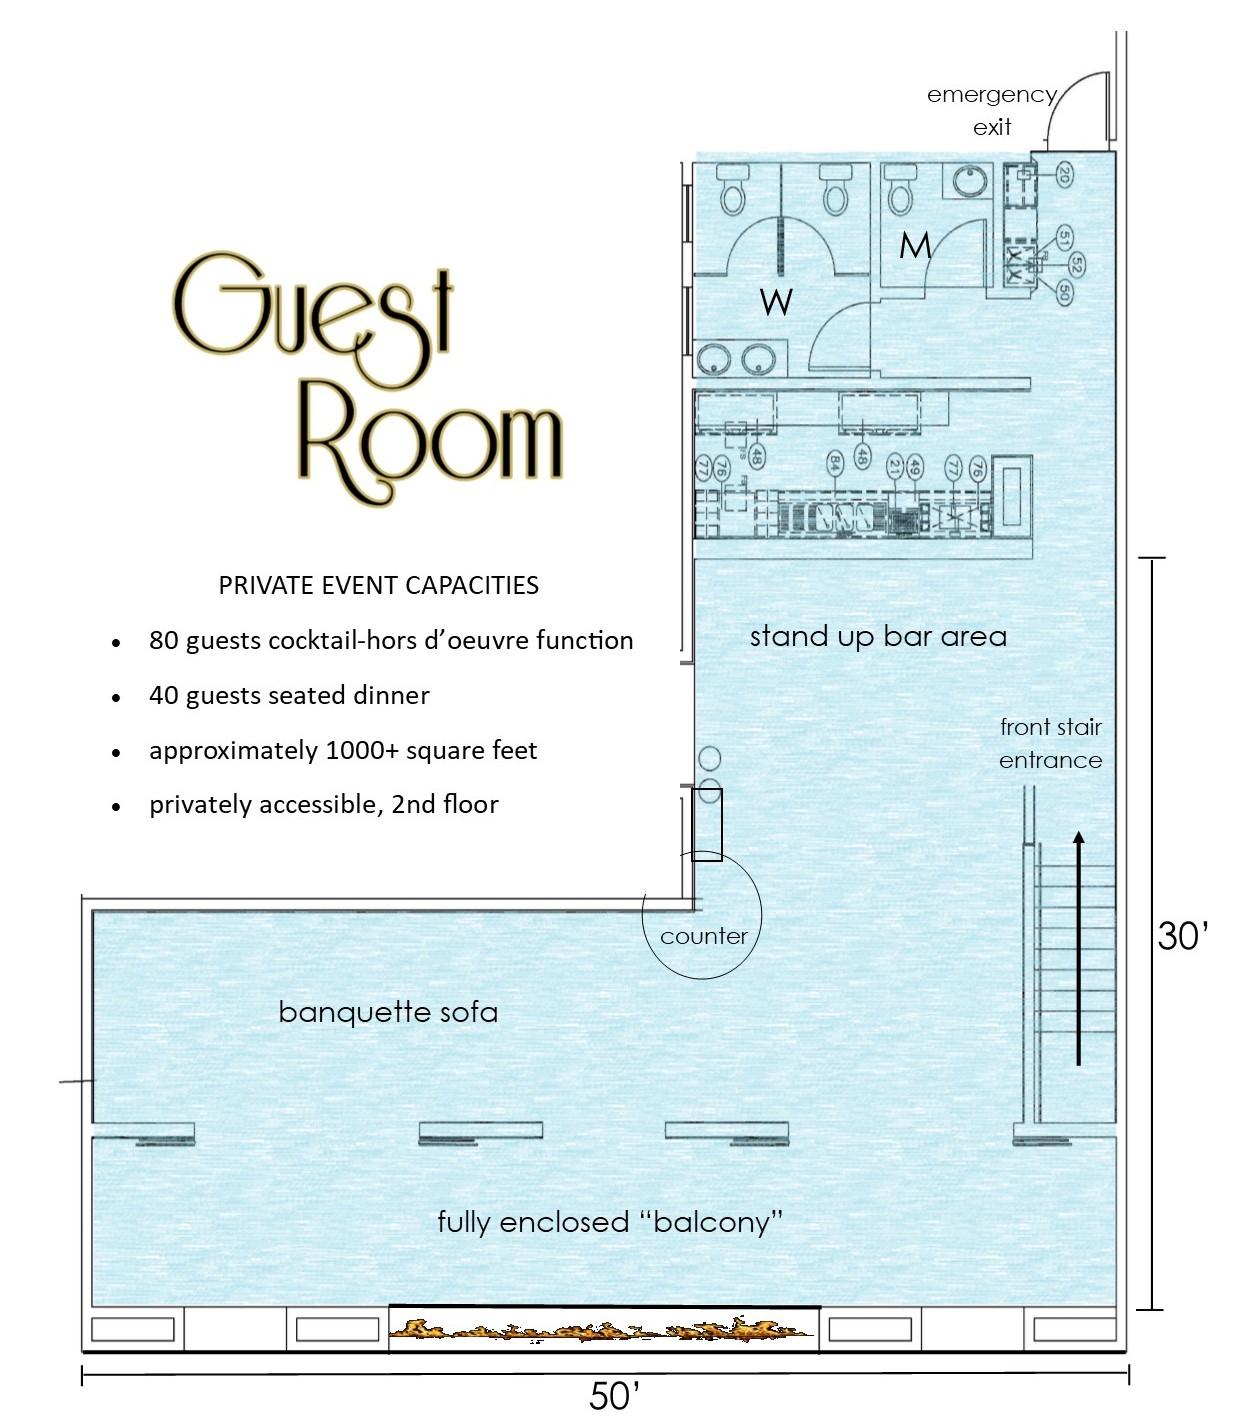 Guest Room Floor Plan 2.jpg